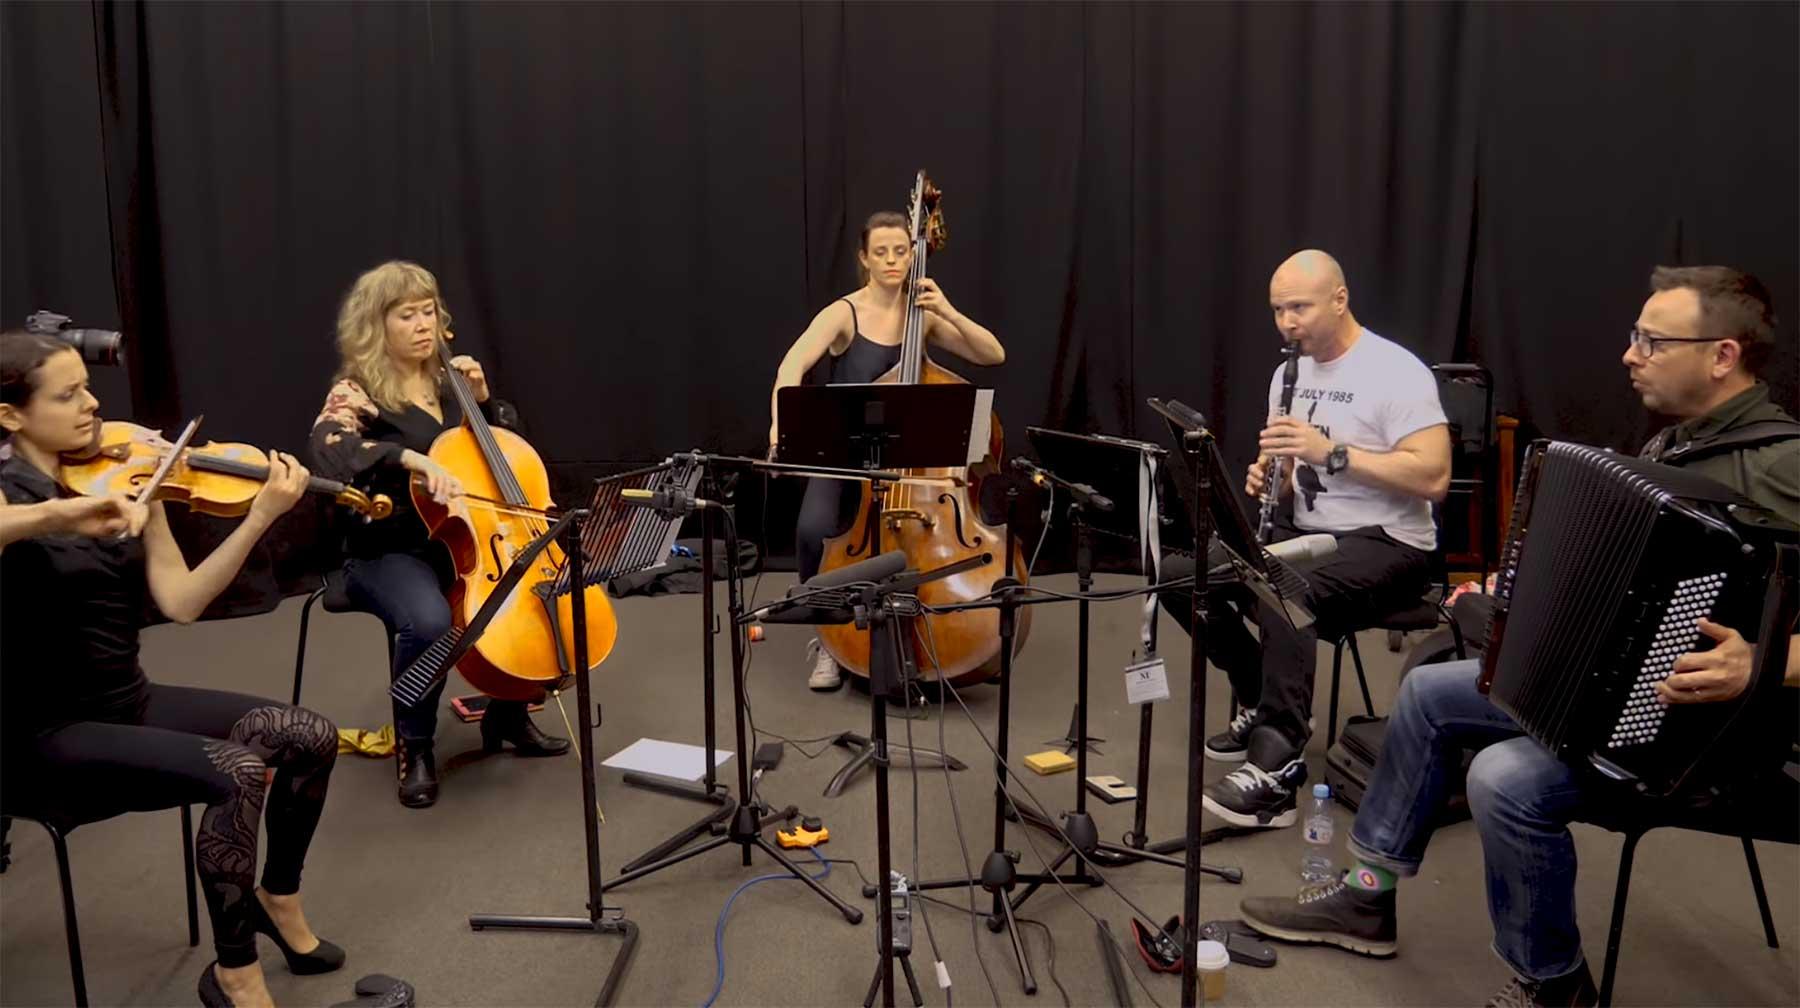 5 KomponistInnen 1 klassisches Thema